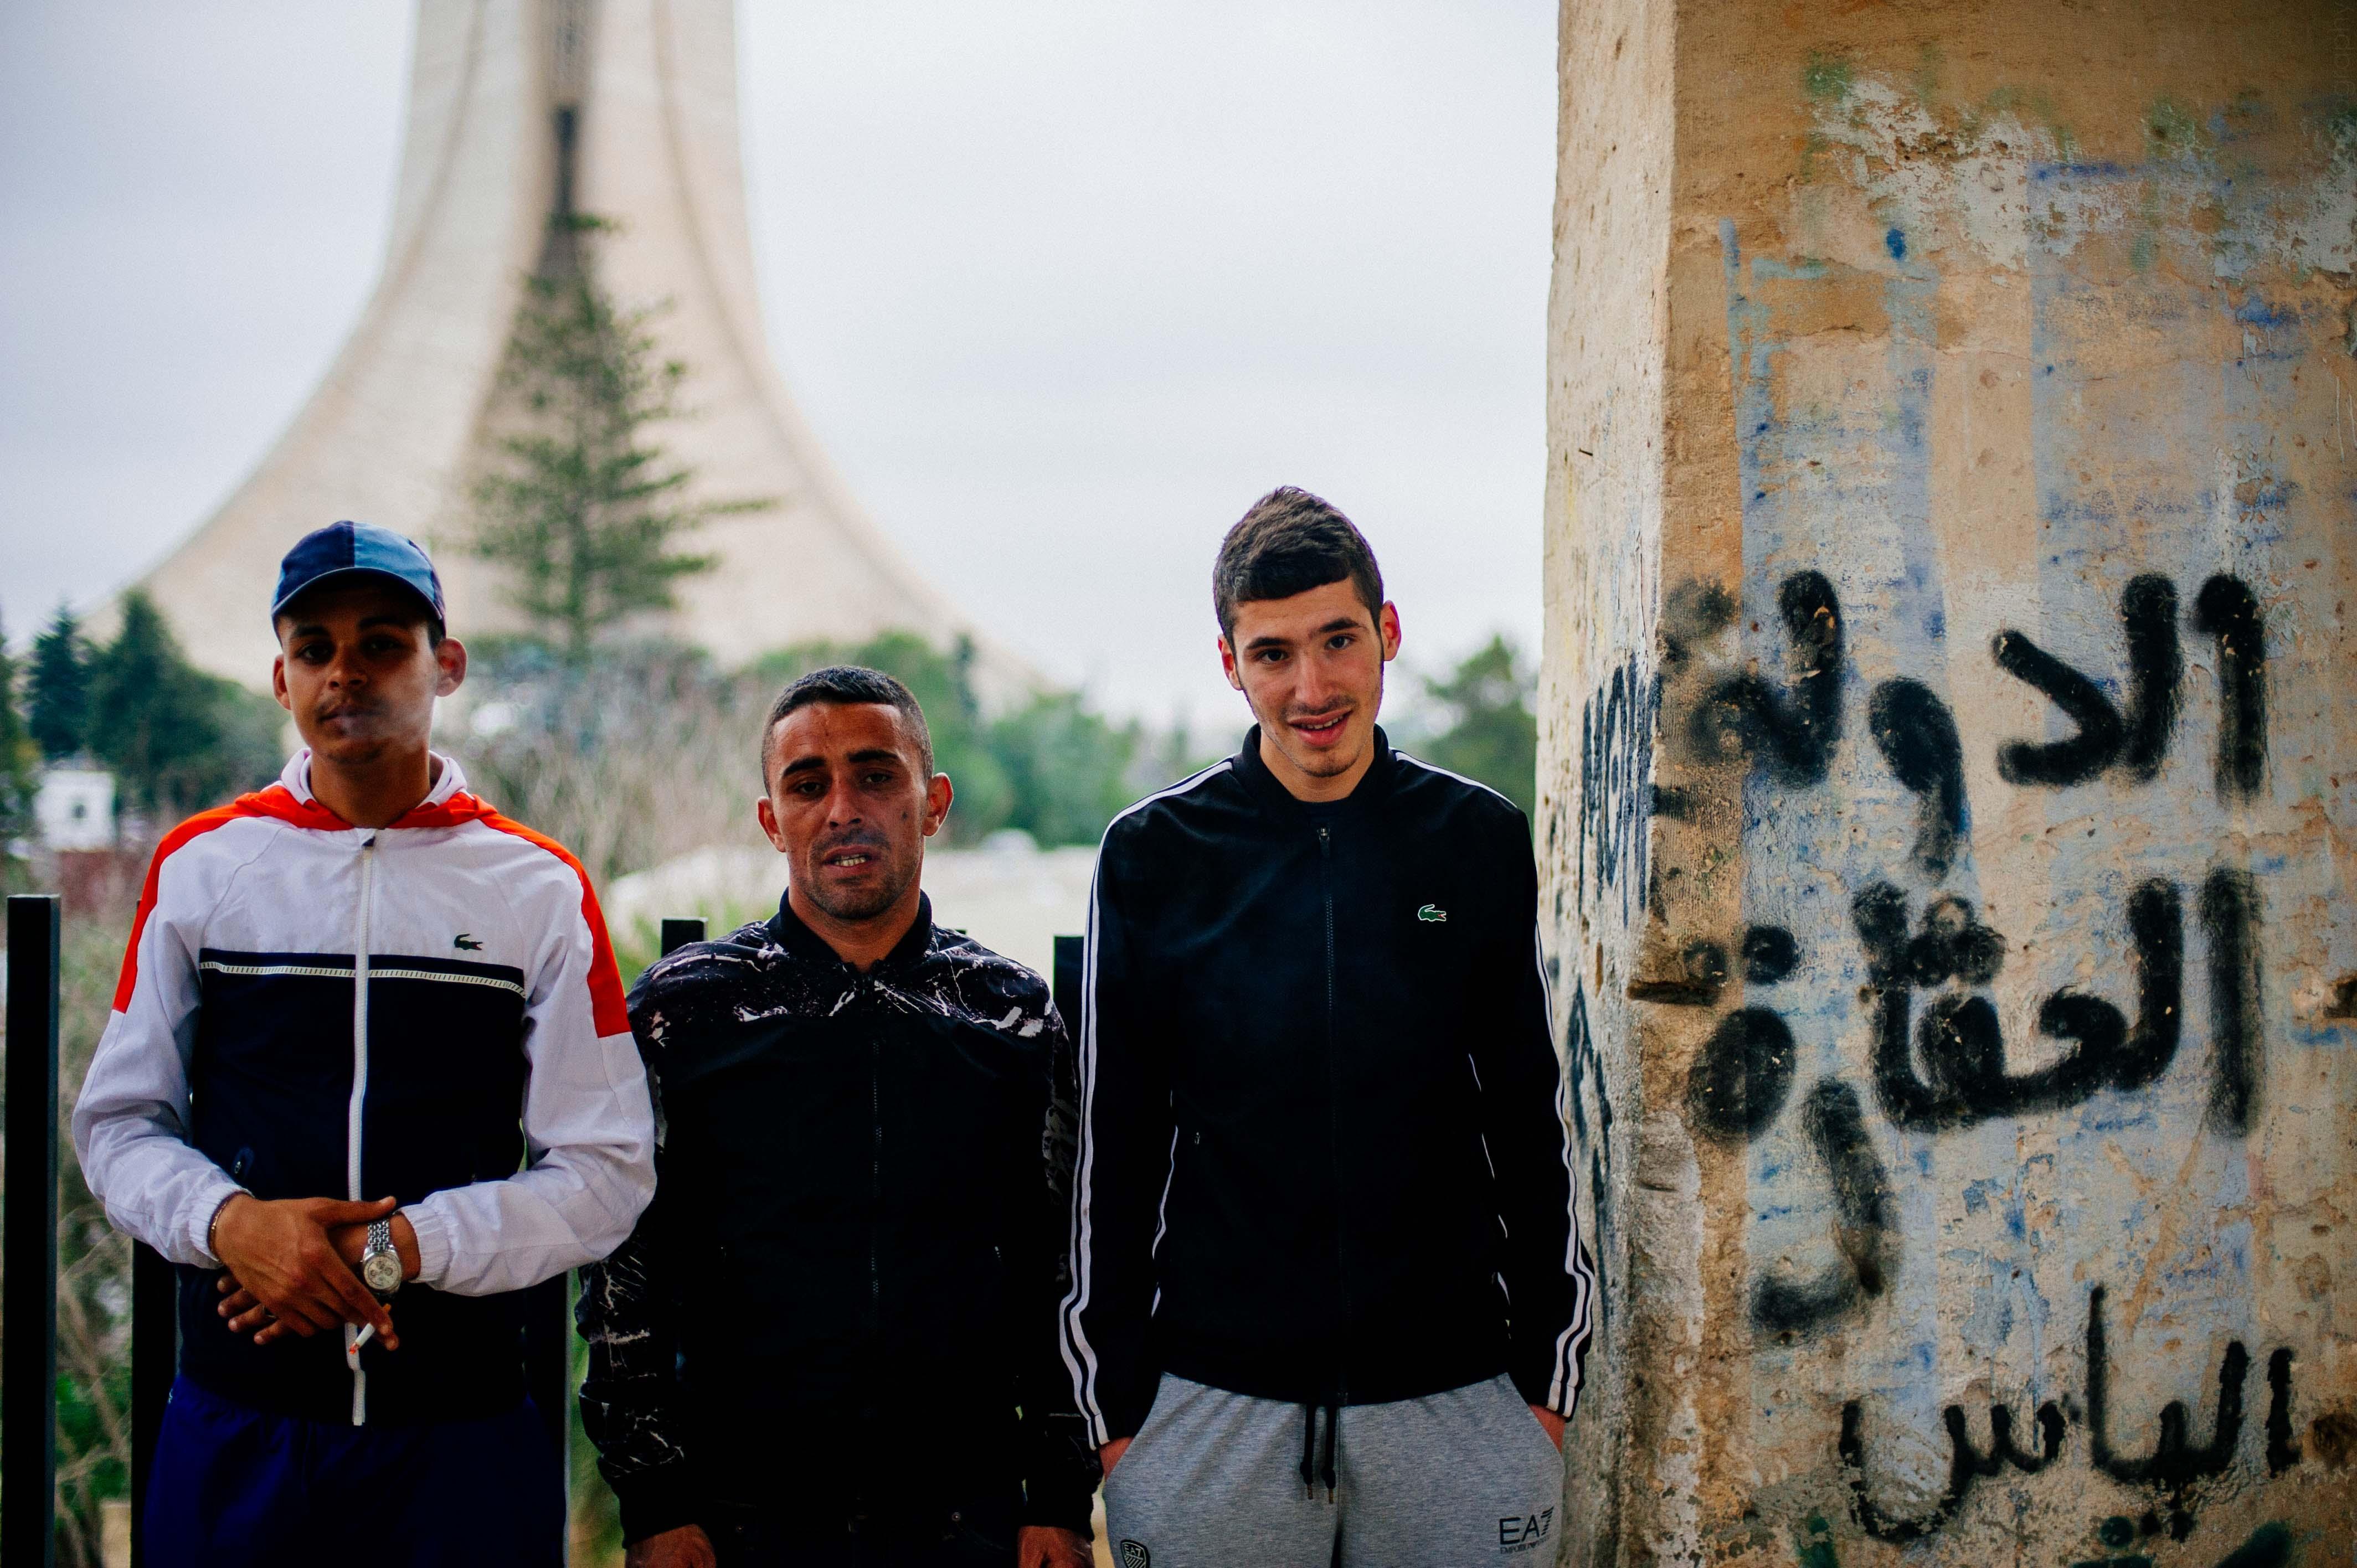 Maqam Echahid - Mémorial du martyr - Alger 4